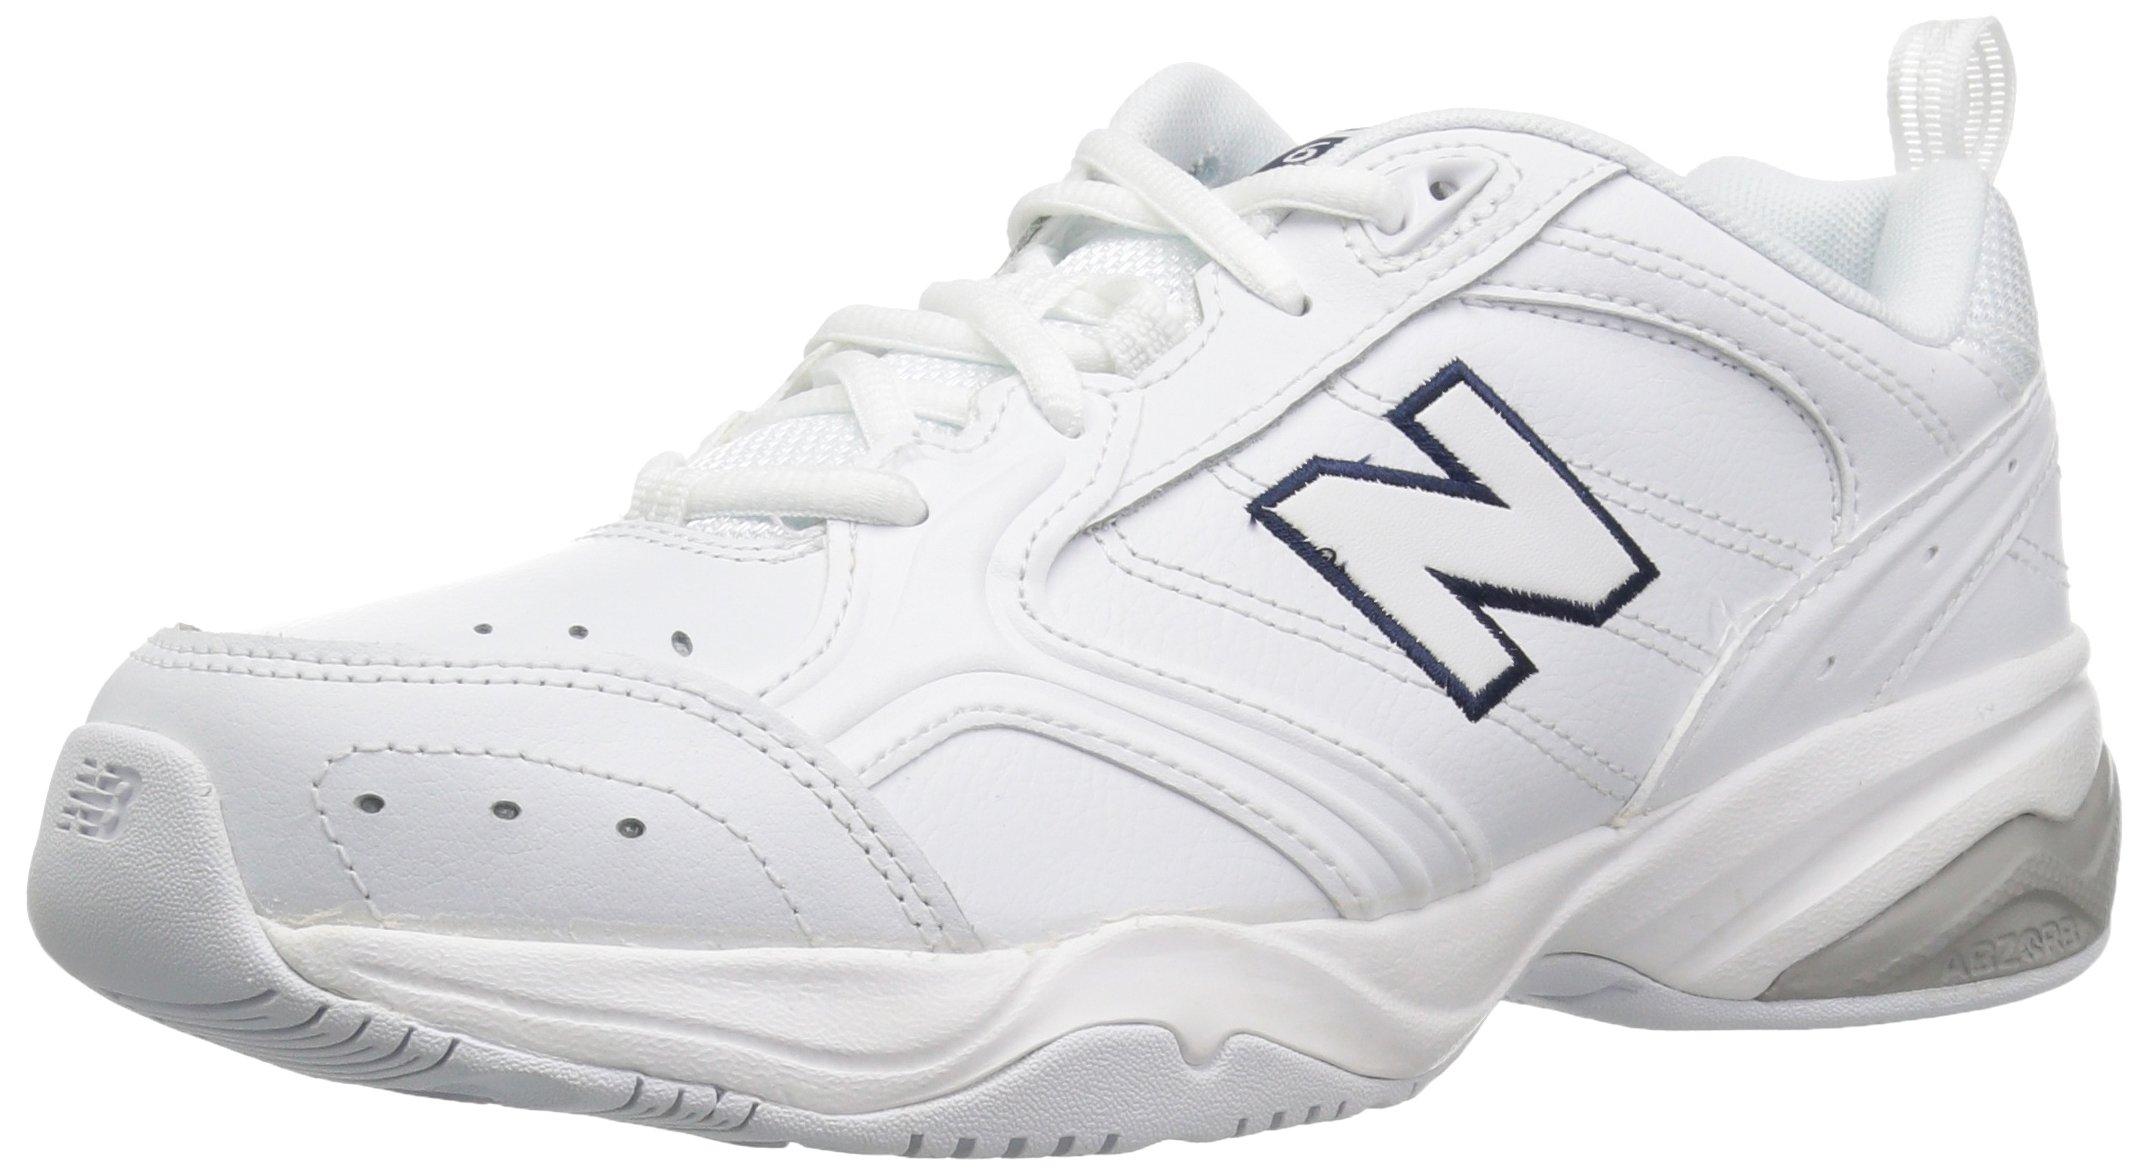 New Balance Women's WX624v2 Training Shoe, White, 8 B US by New Balance